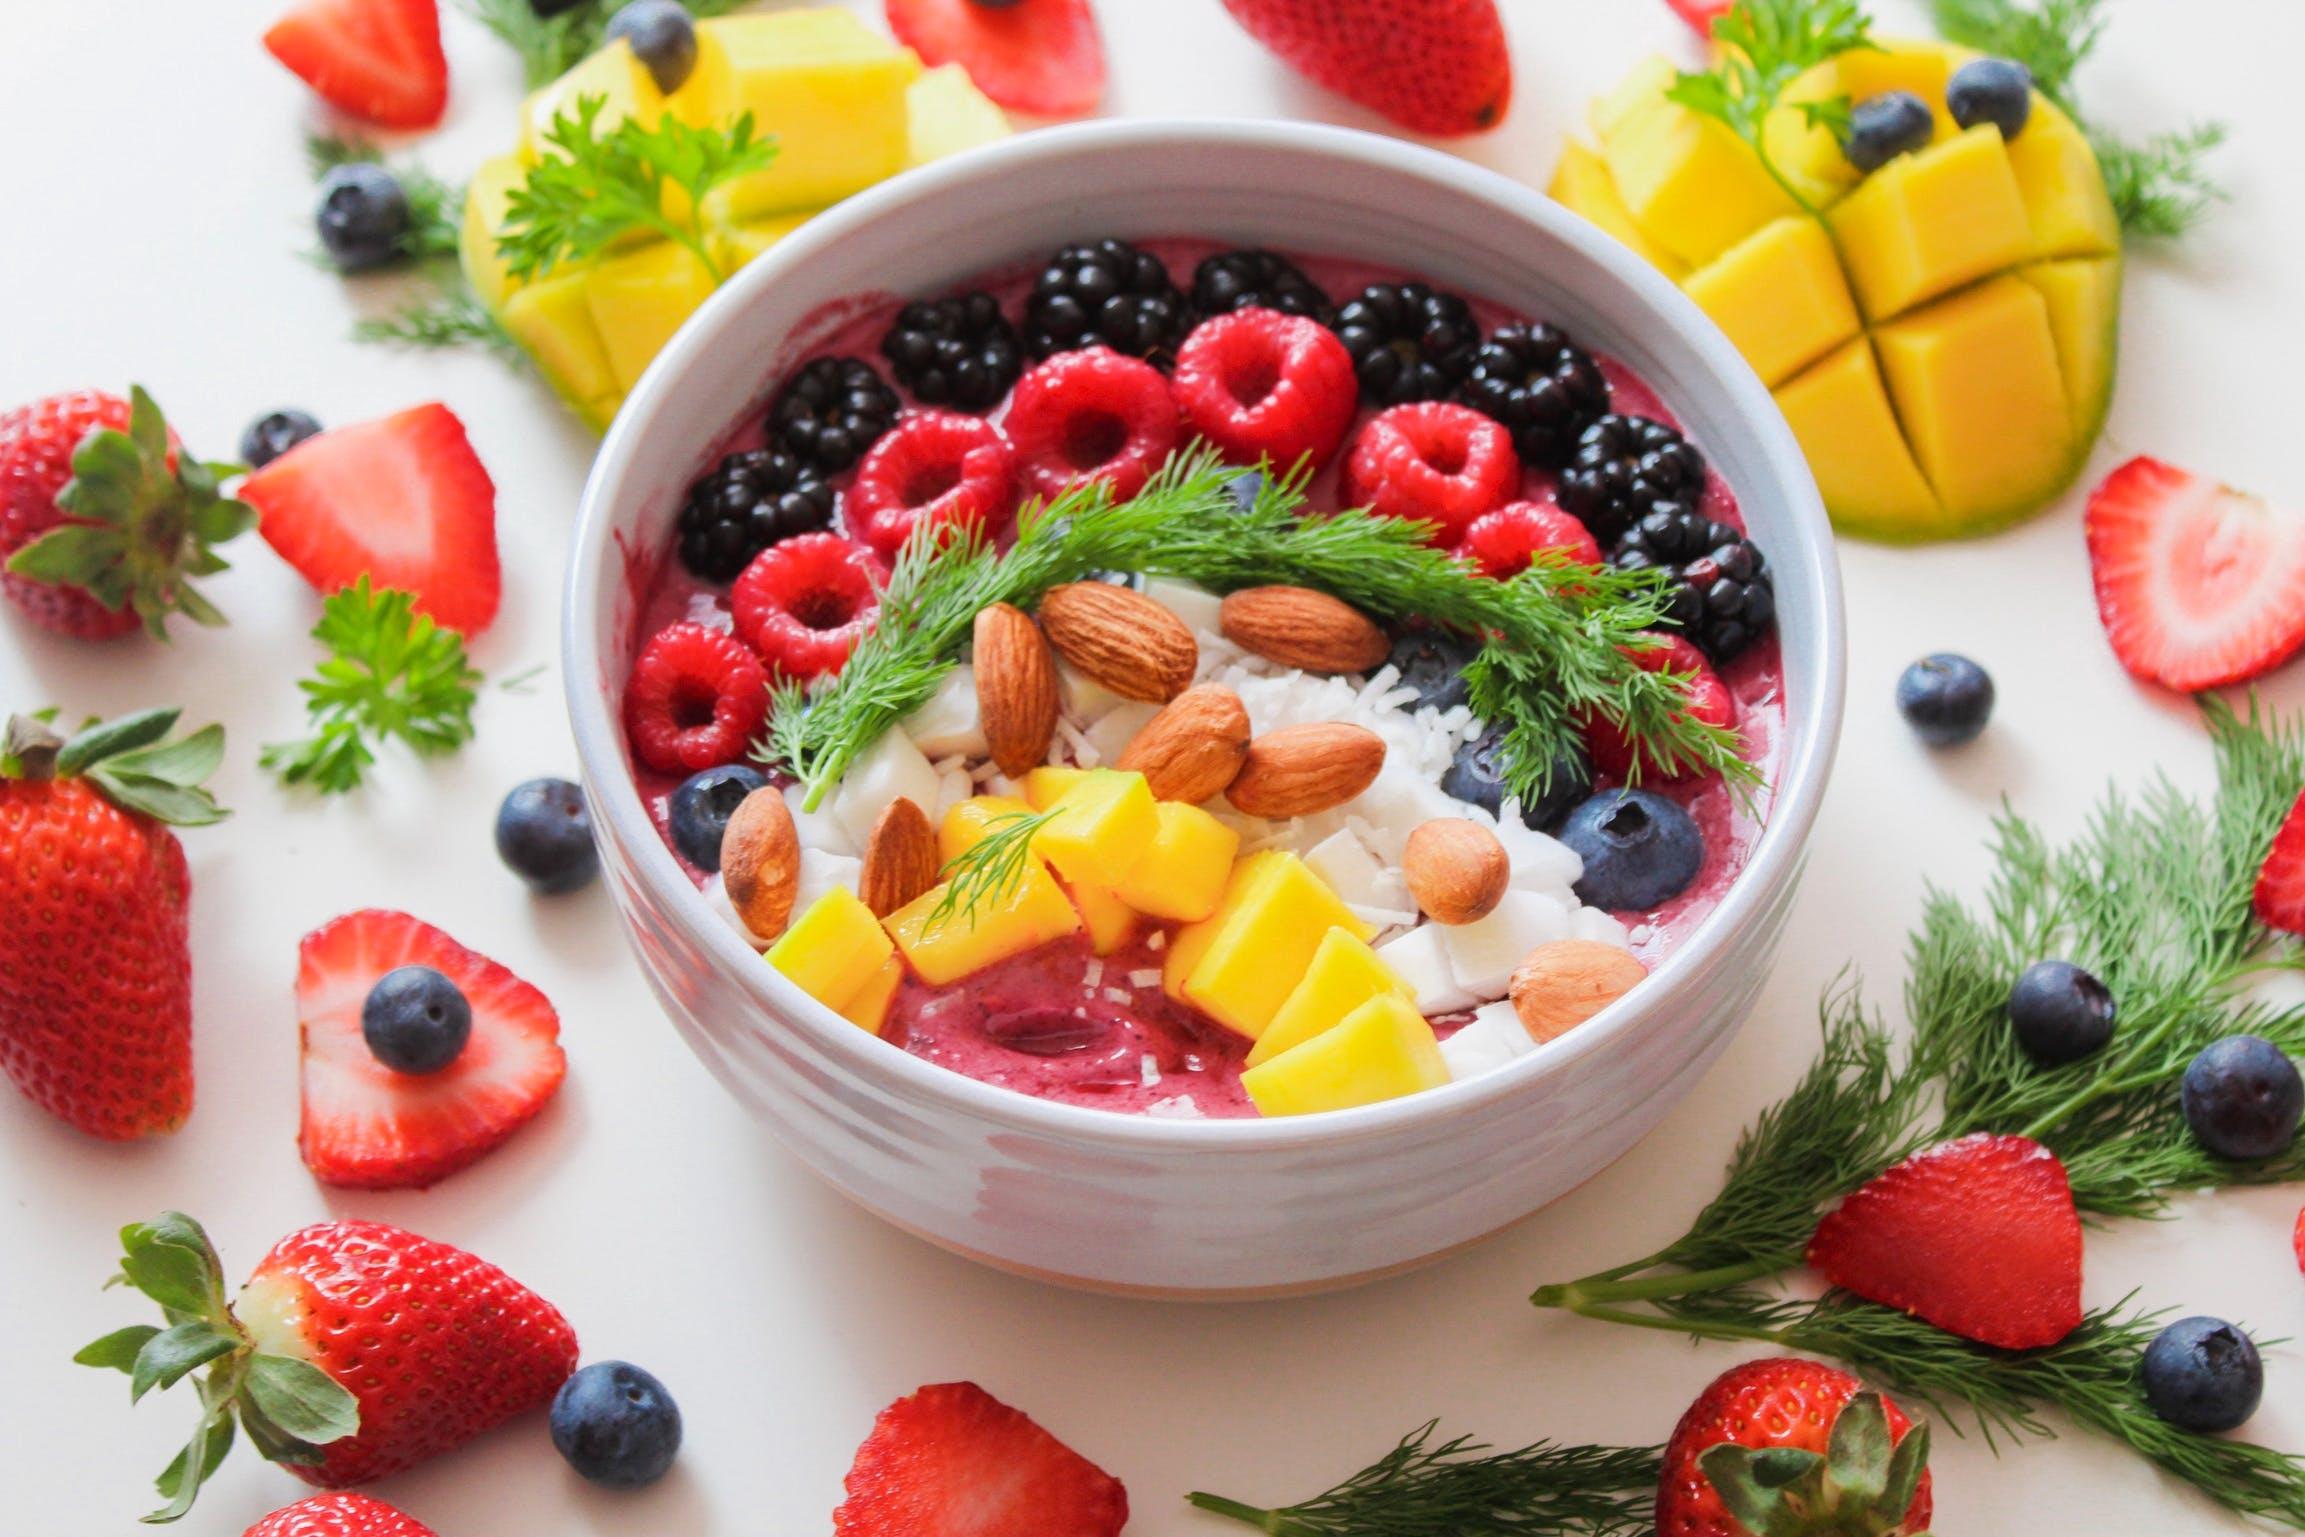 Close-Up Photography of Food Dessert